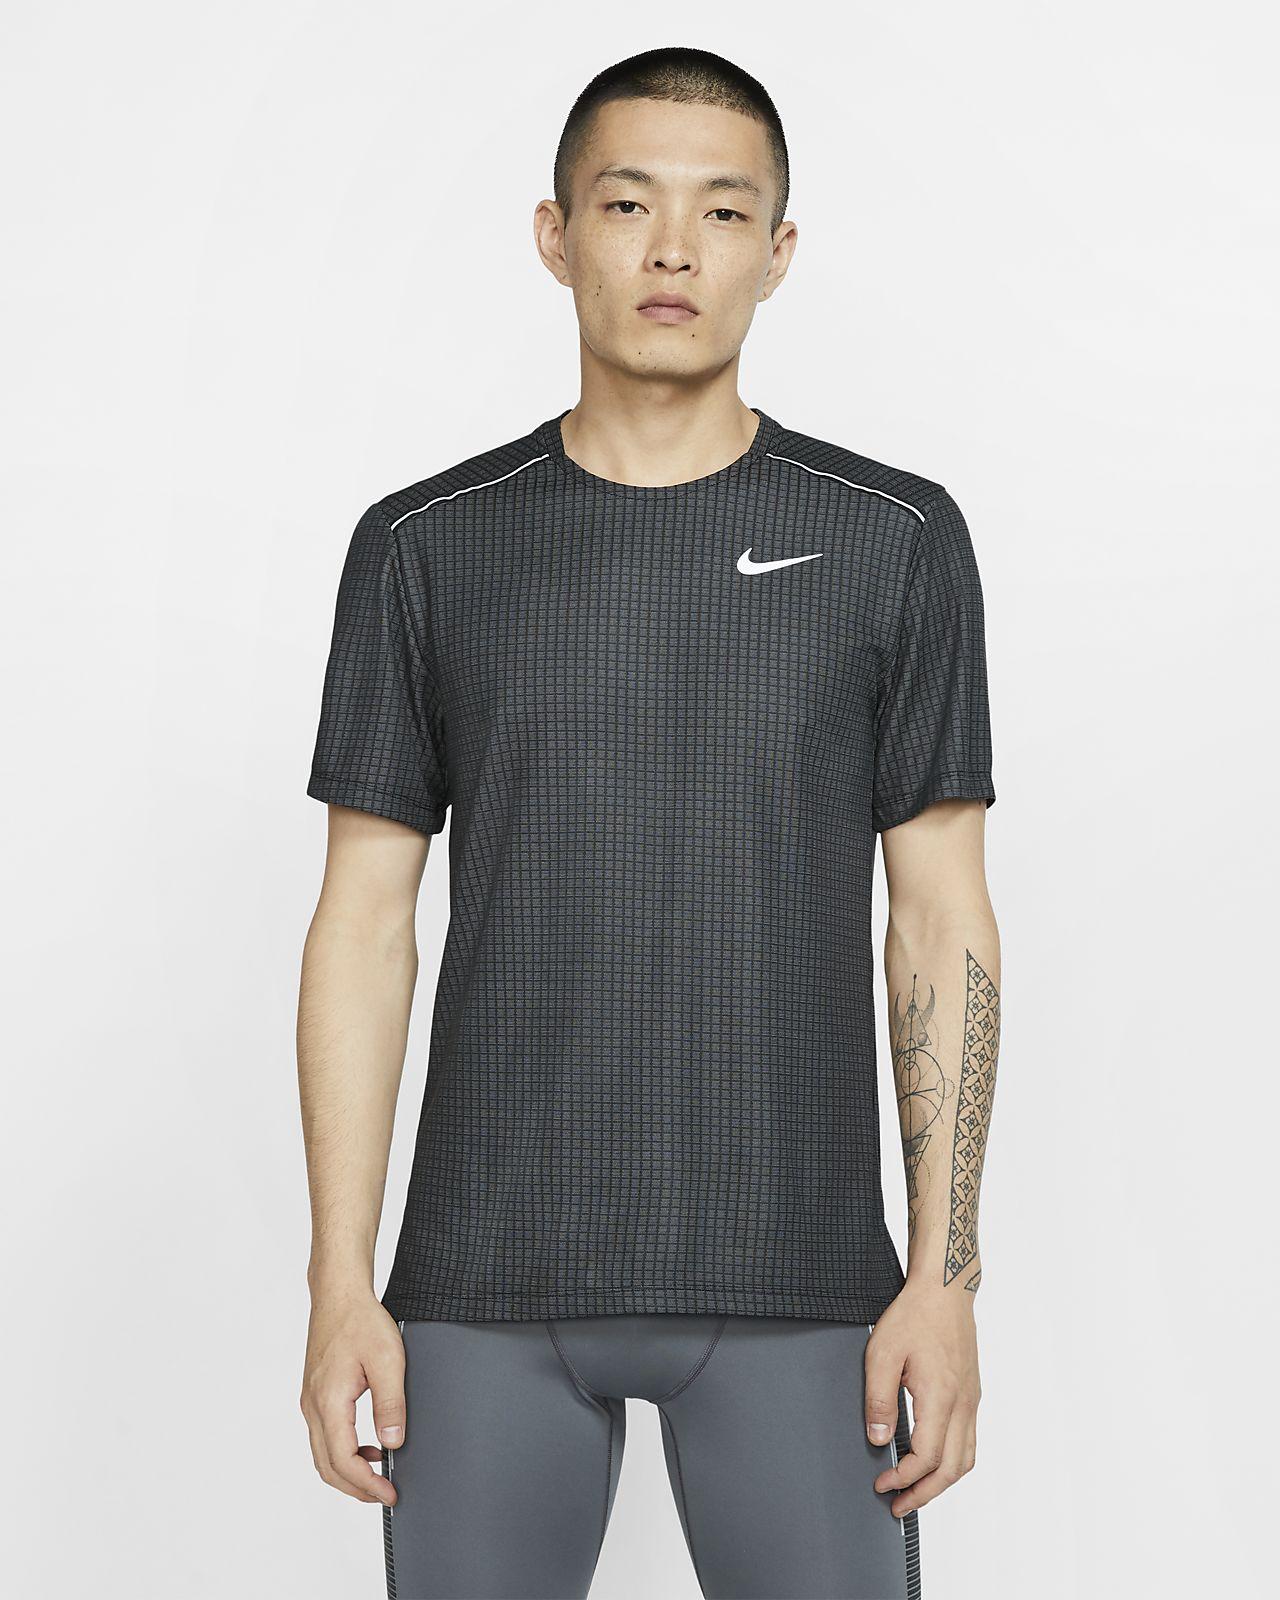 Maglia da running a manica corta Nike Miler - Uomo